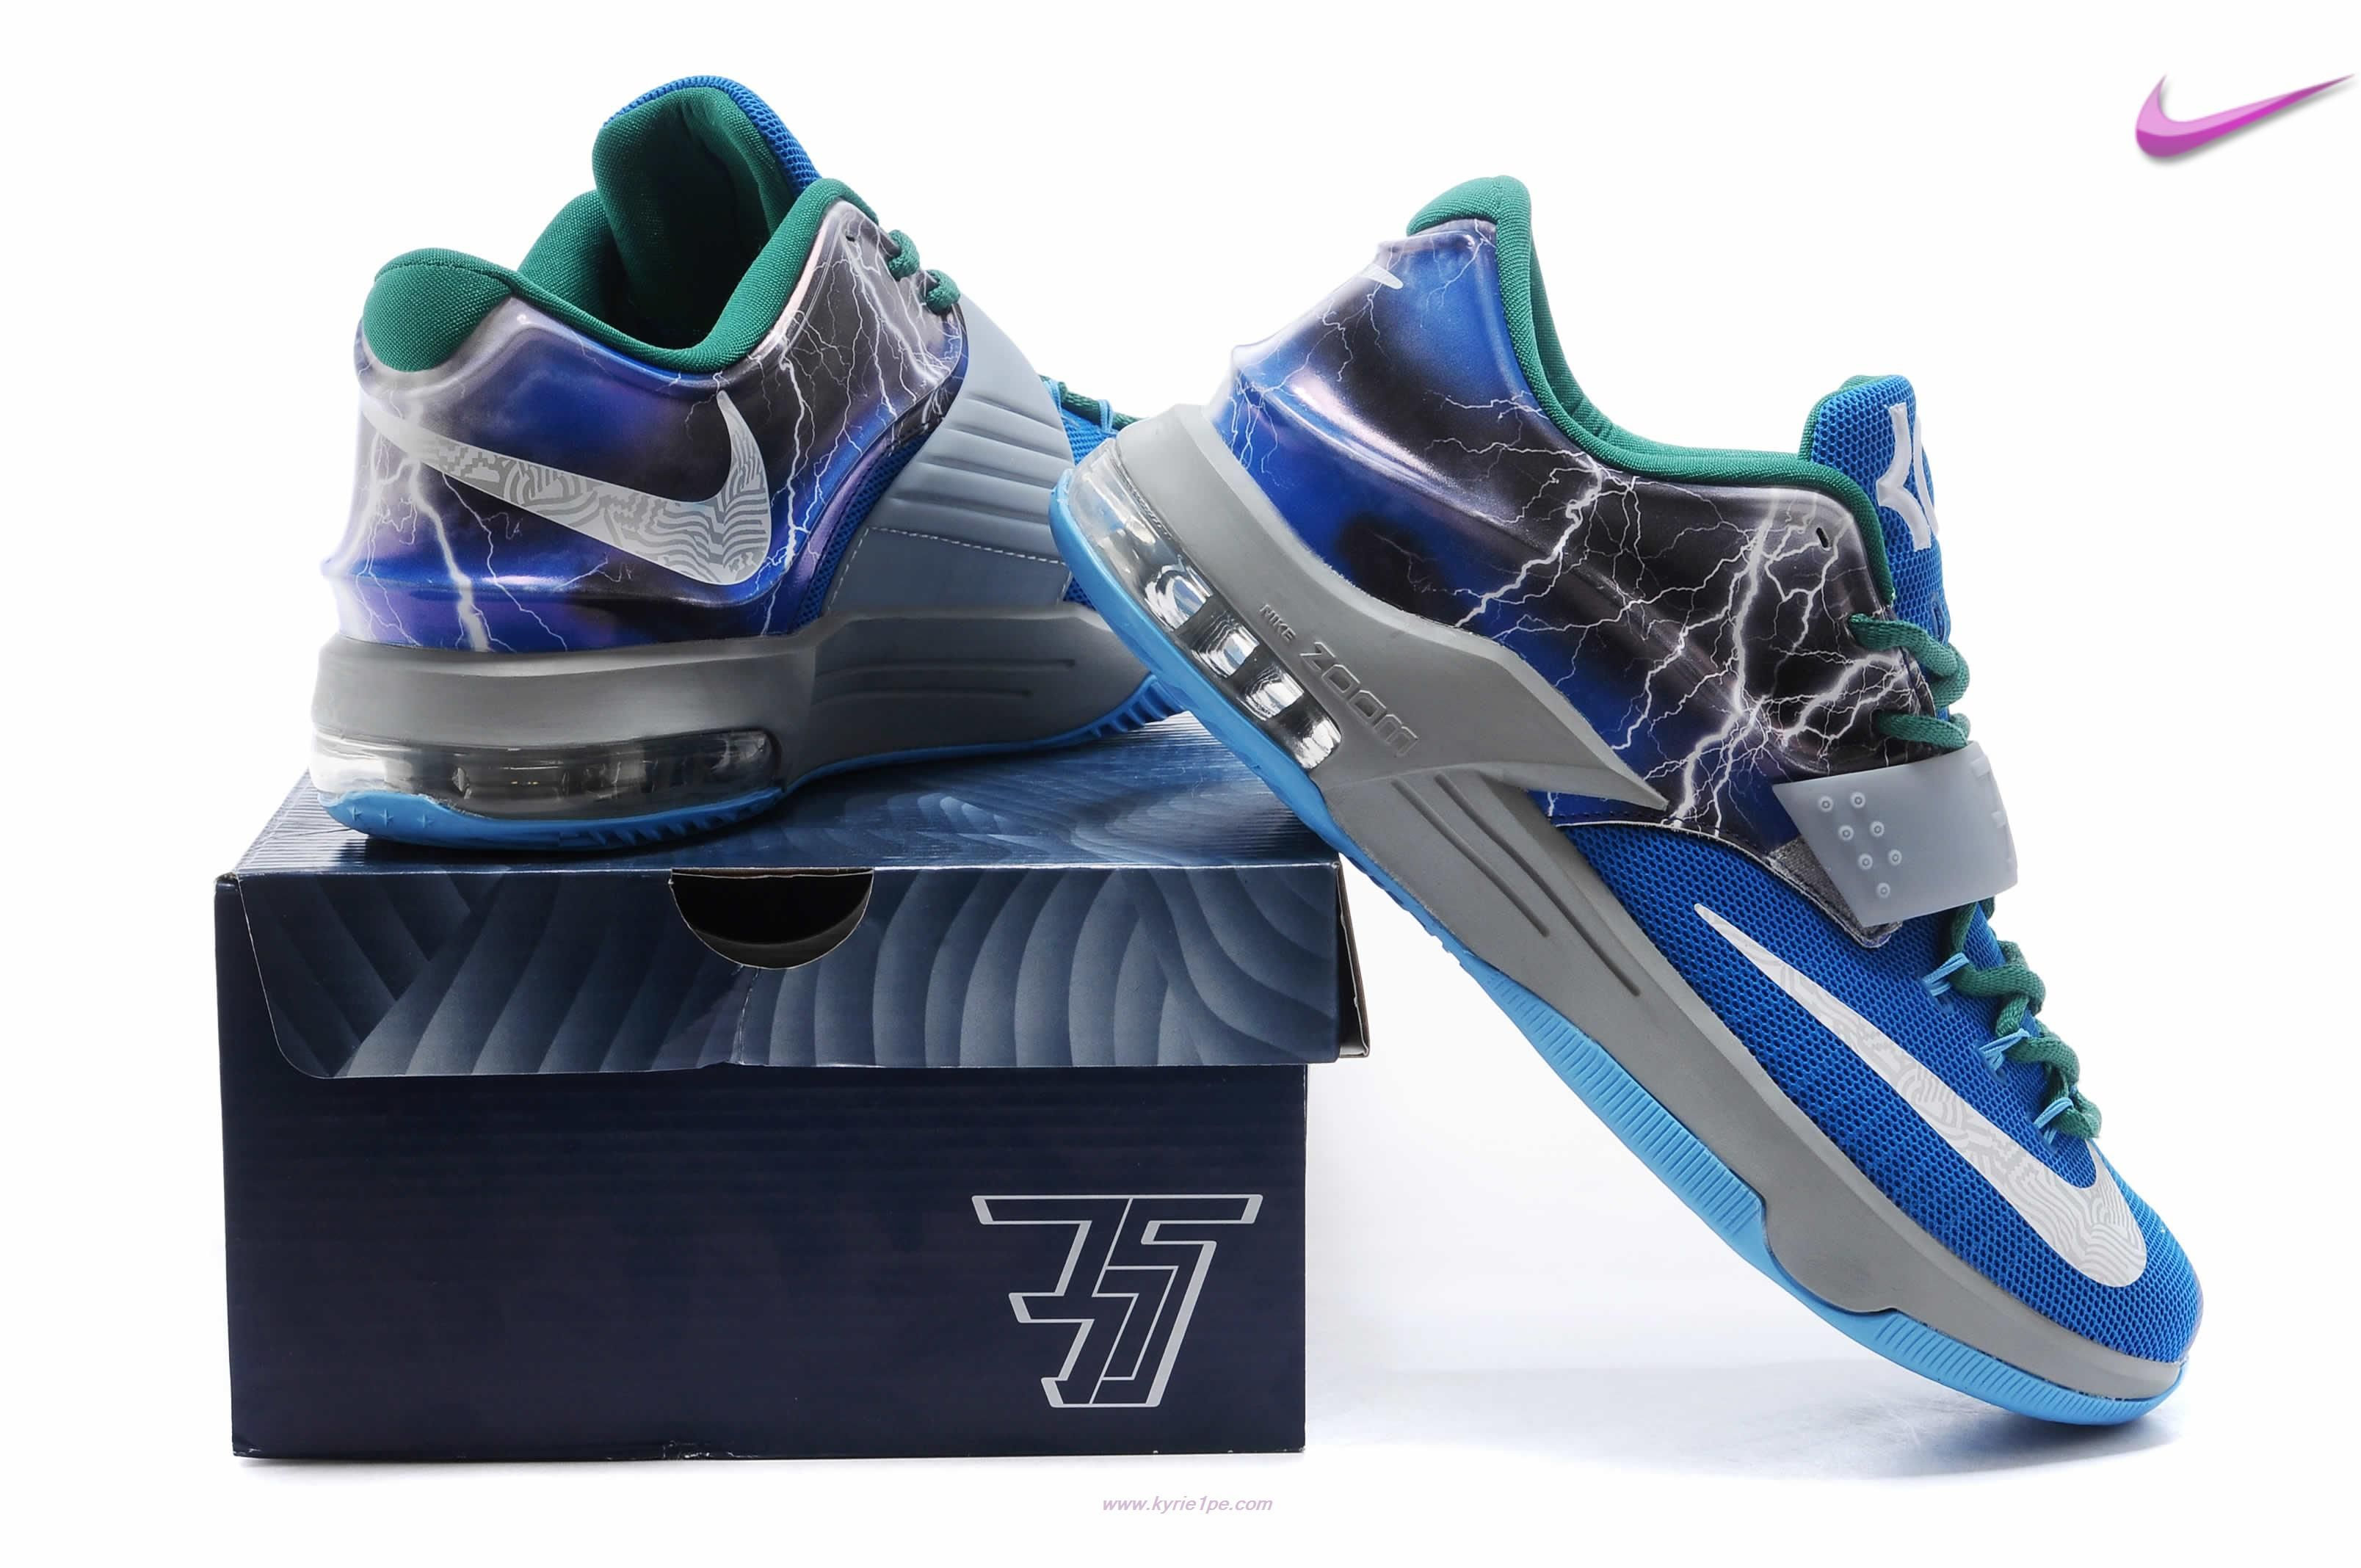 online retailer add3f 679c4 scarpe da basket migliori